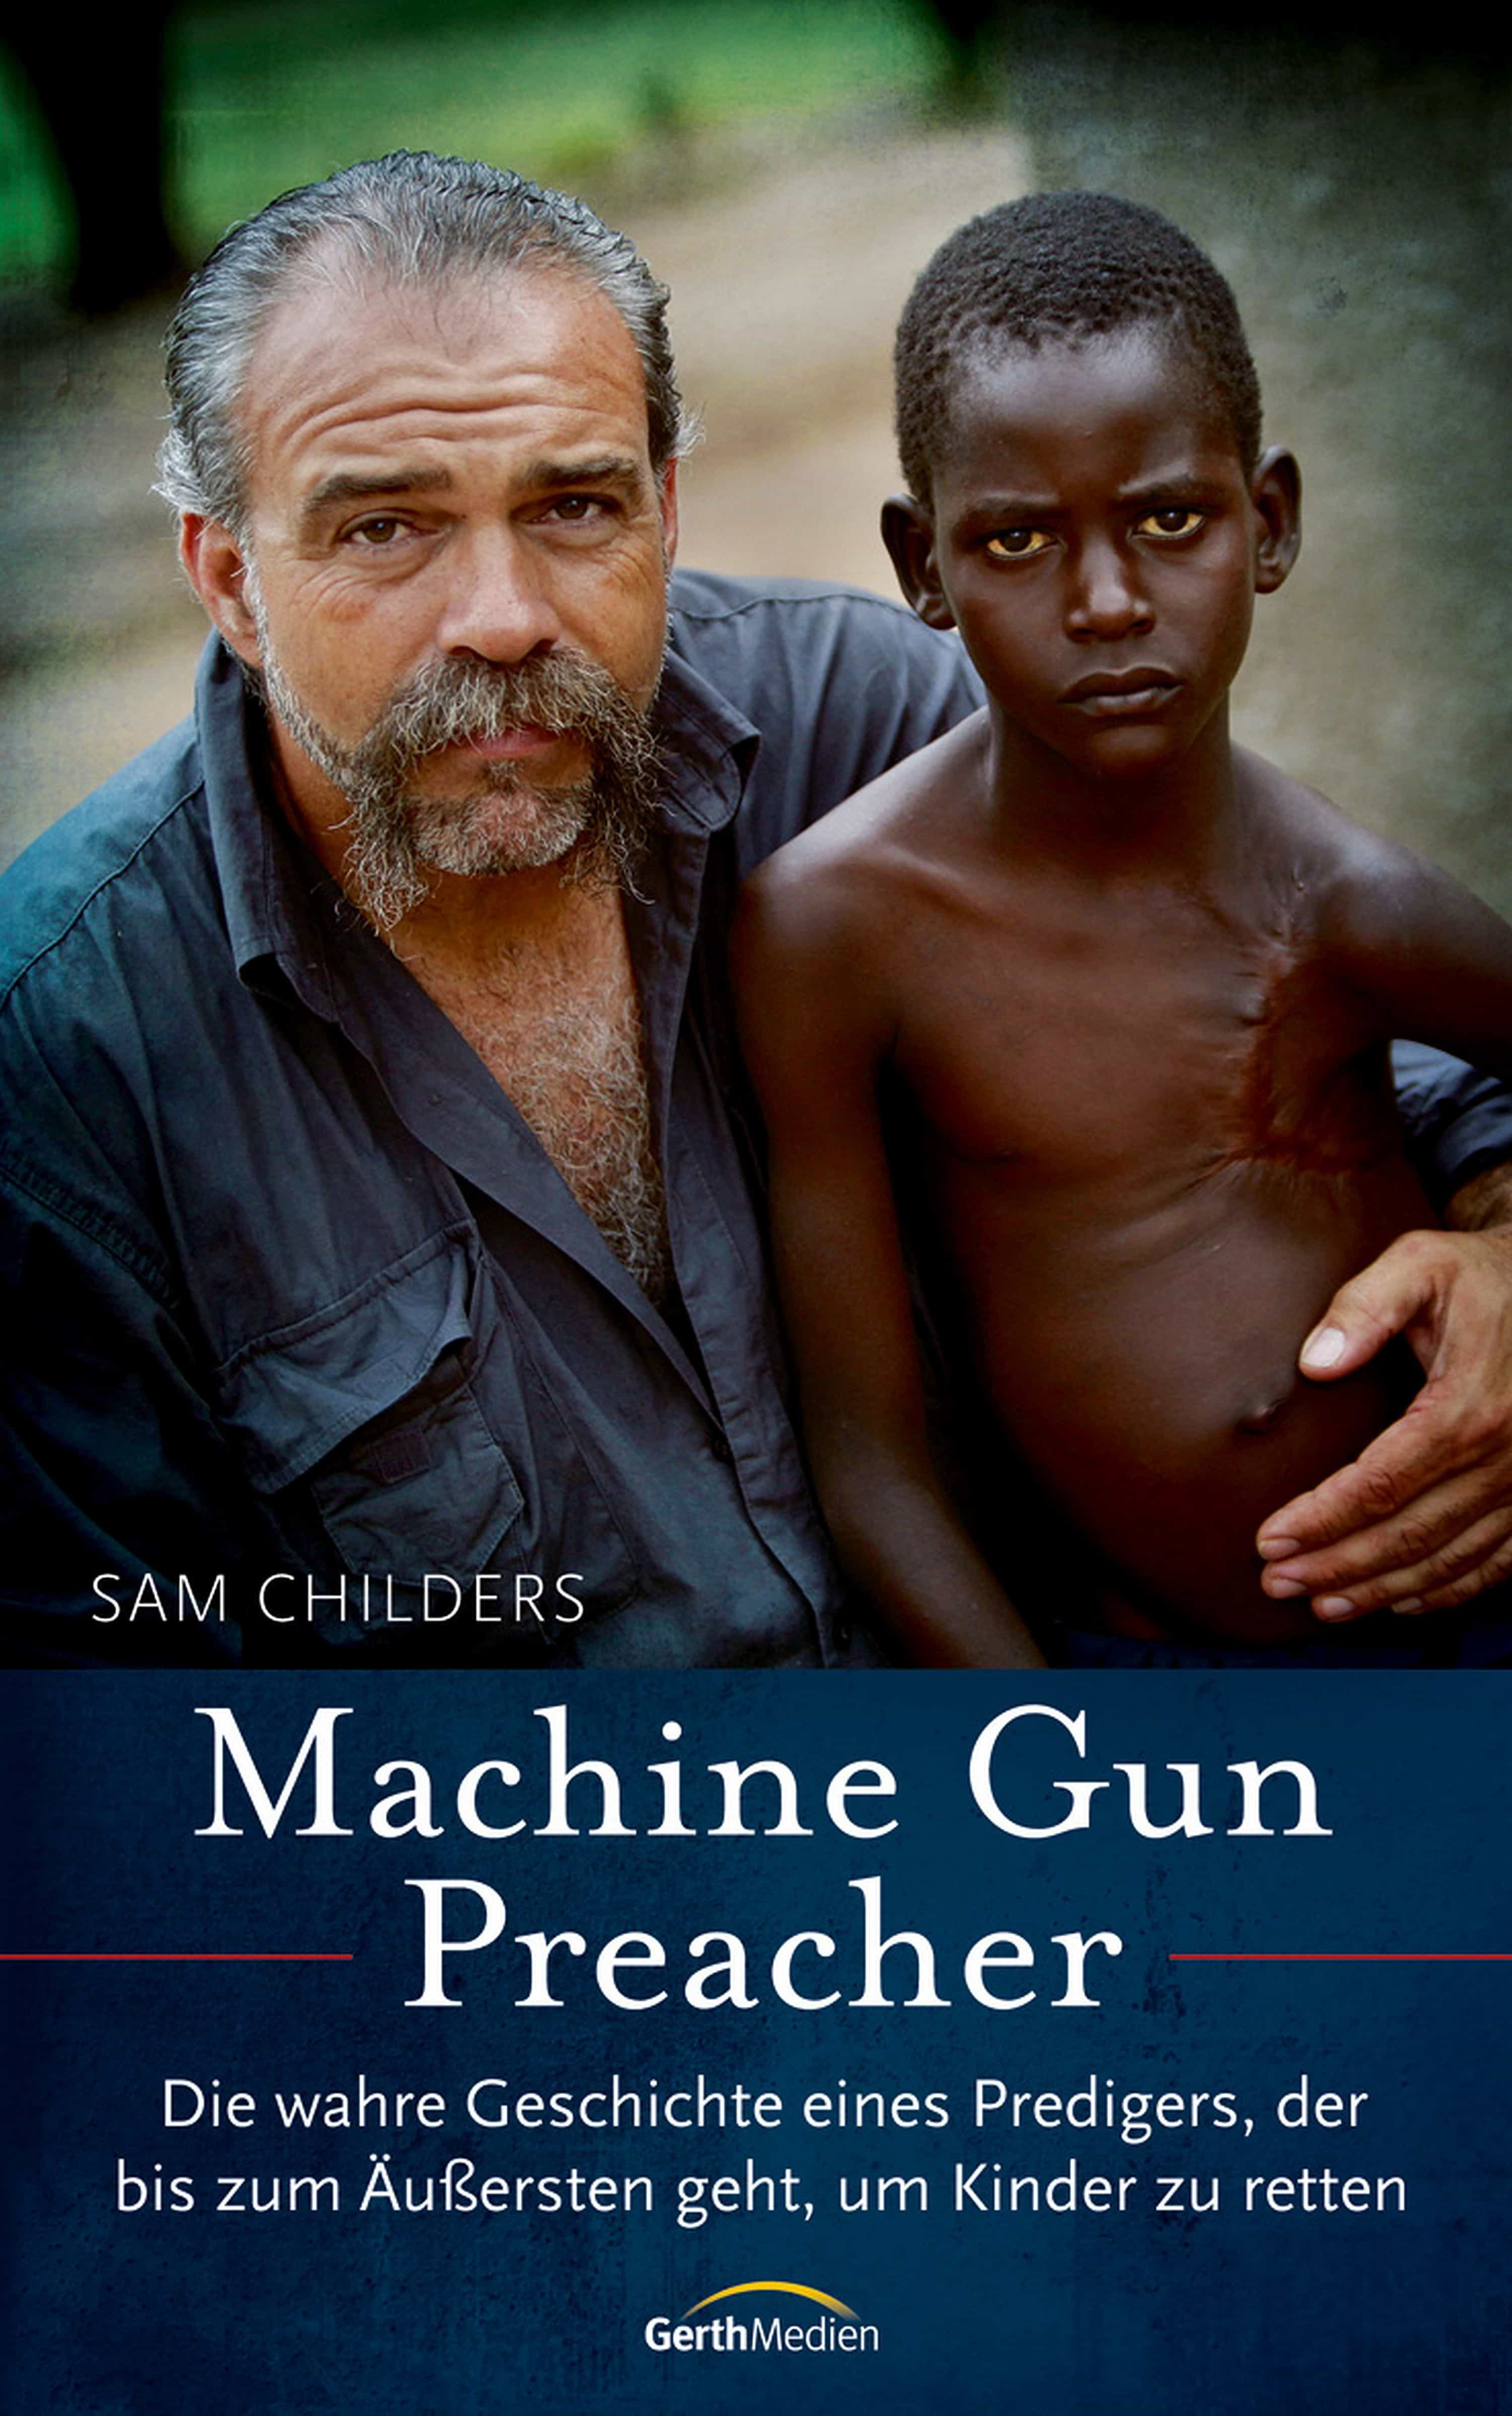 Machine Gun Preacher Ebook Sam Childers Descargar Libro Pdf O